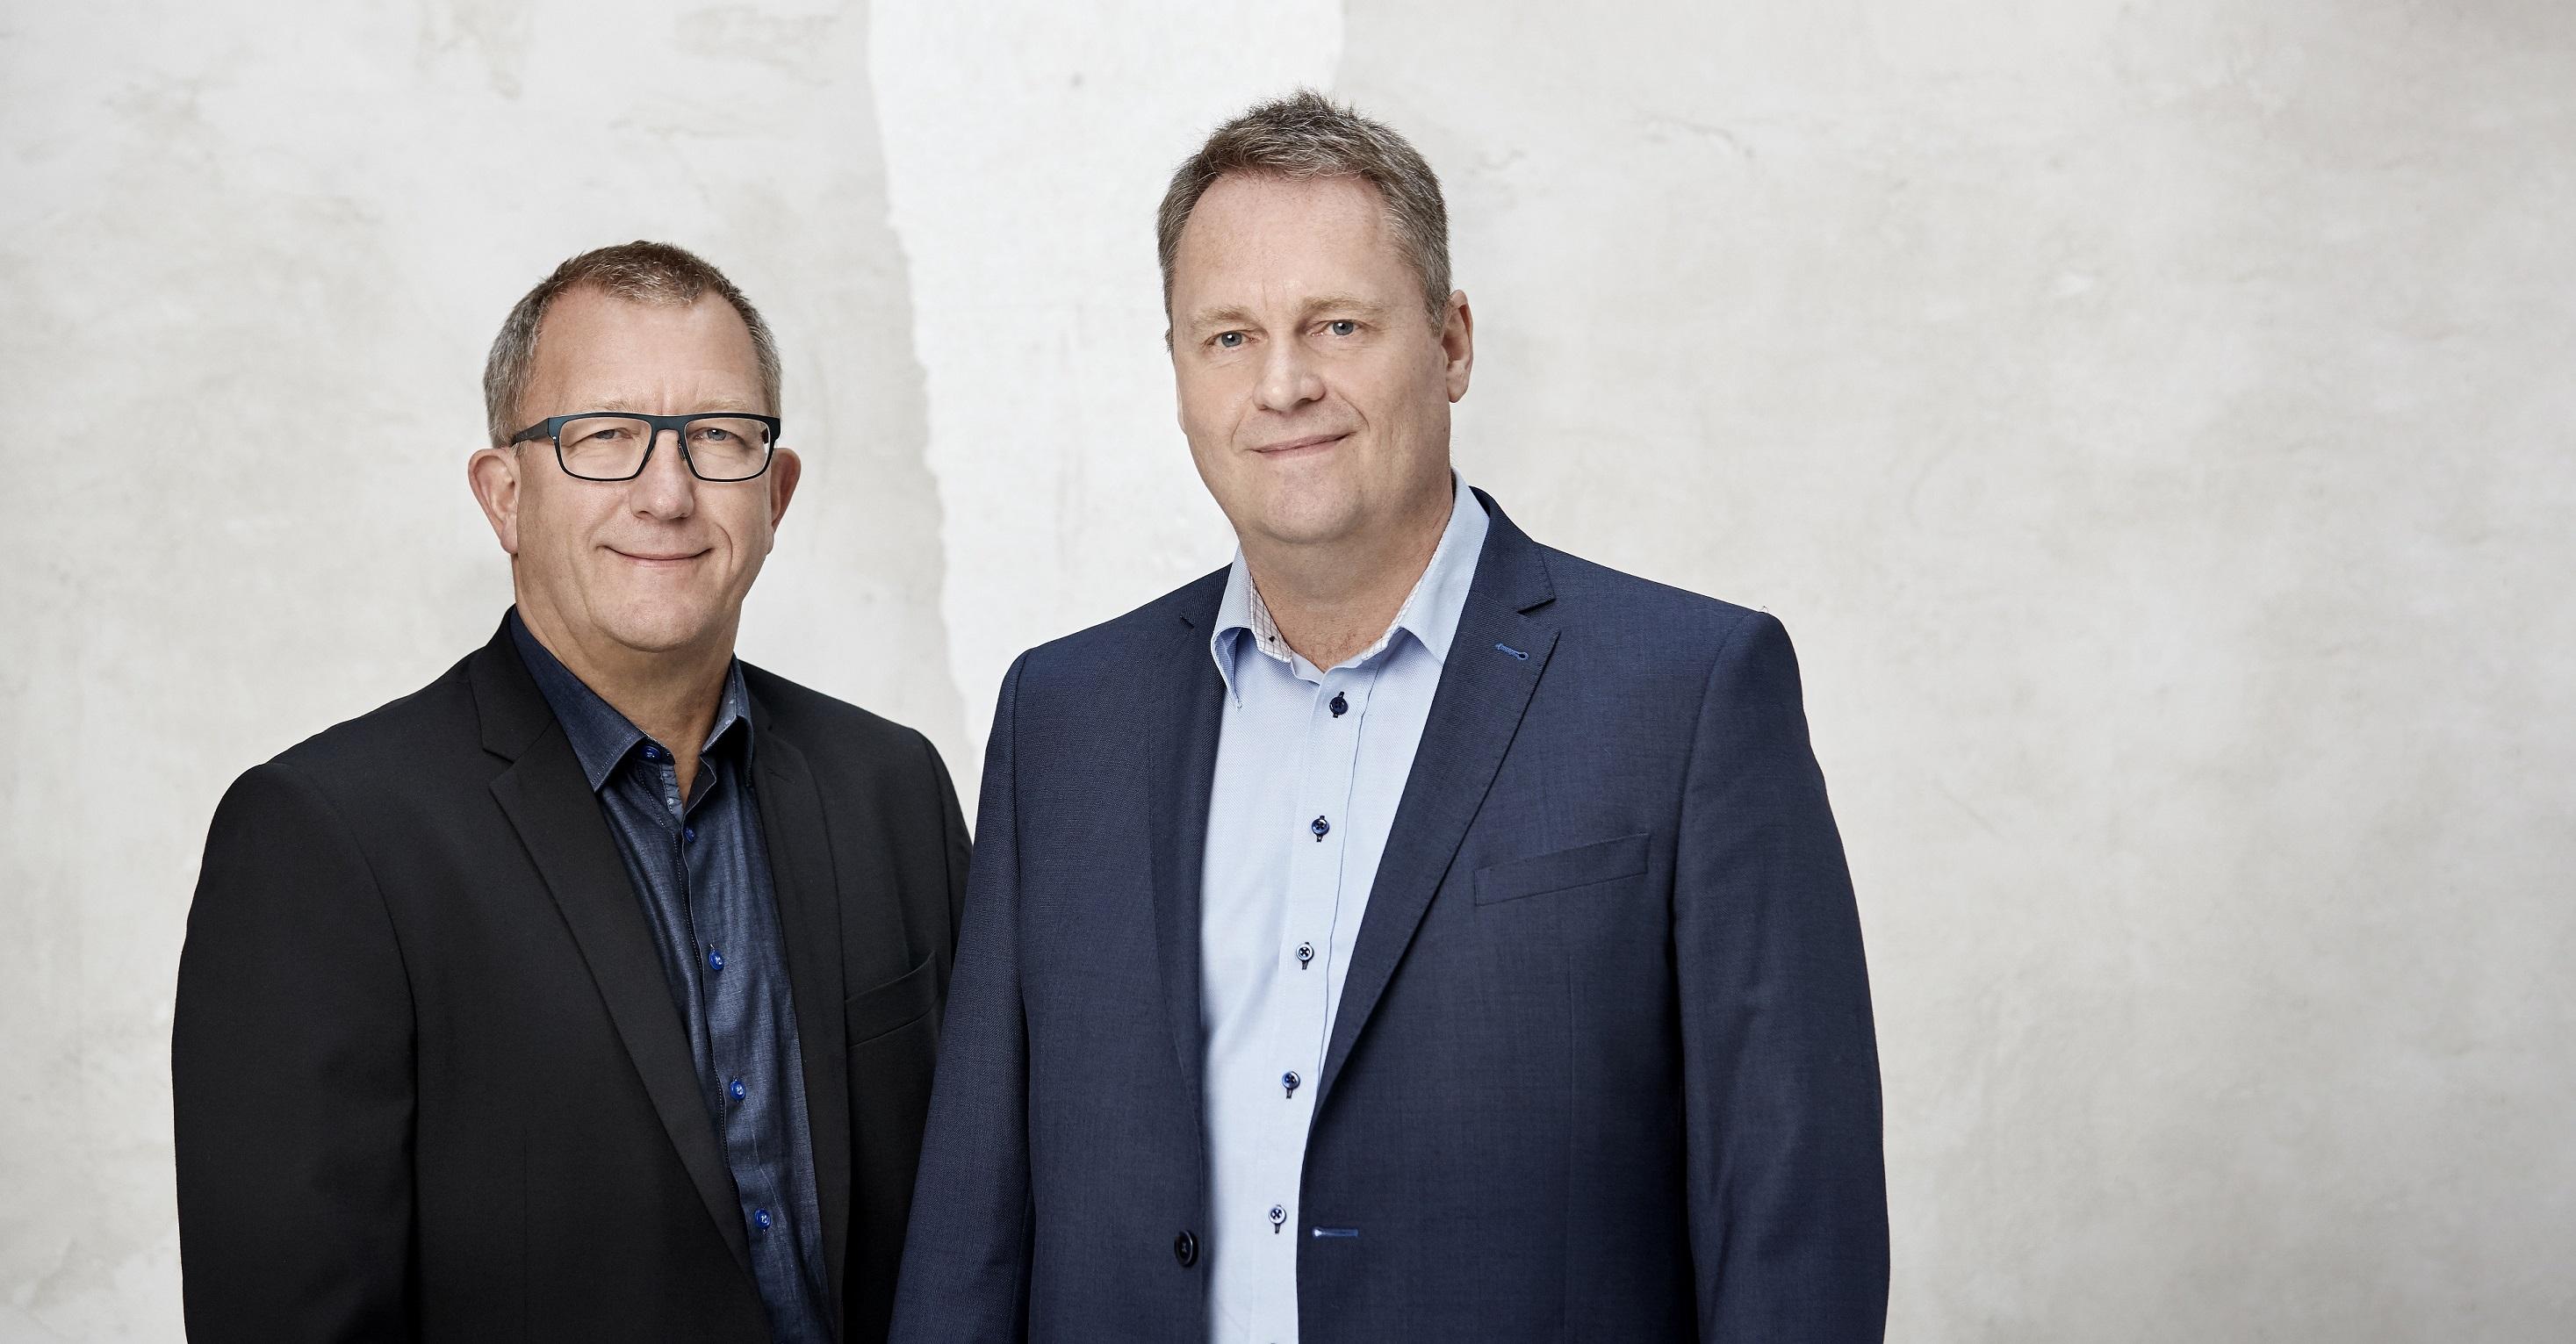 ALPI Danmark: record-high profit in 2018